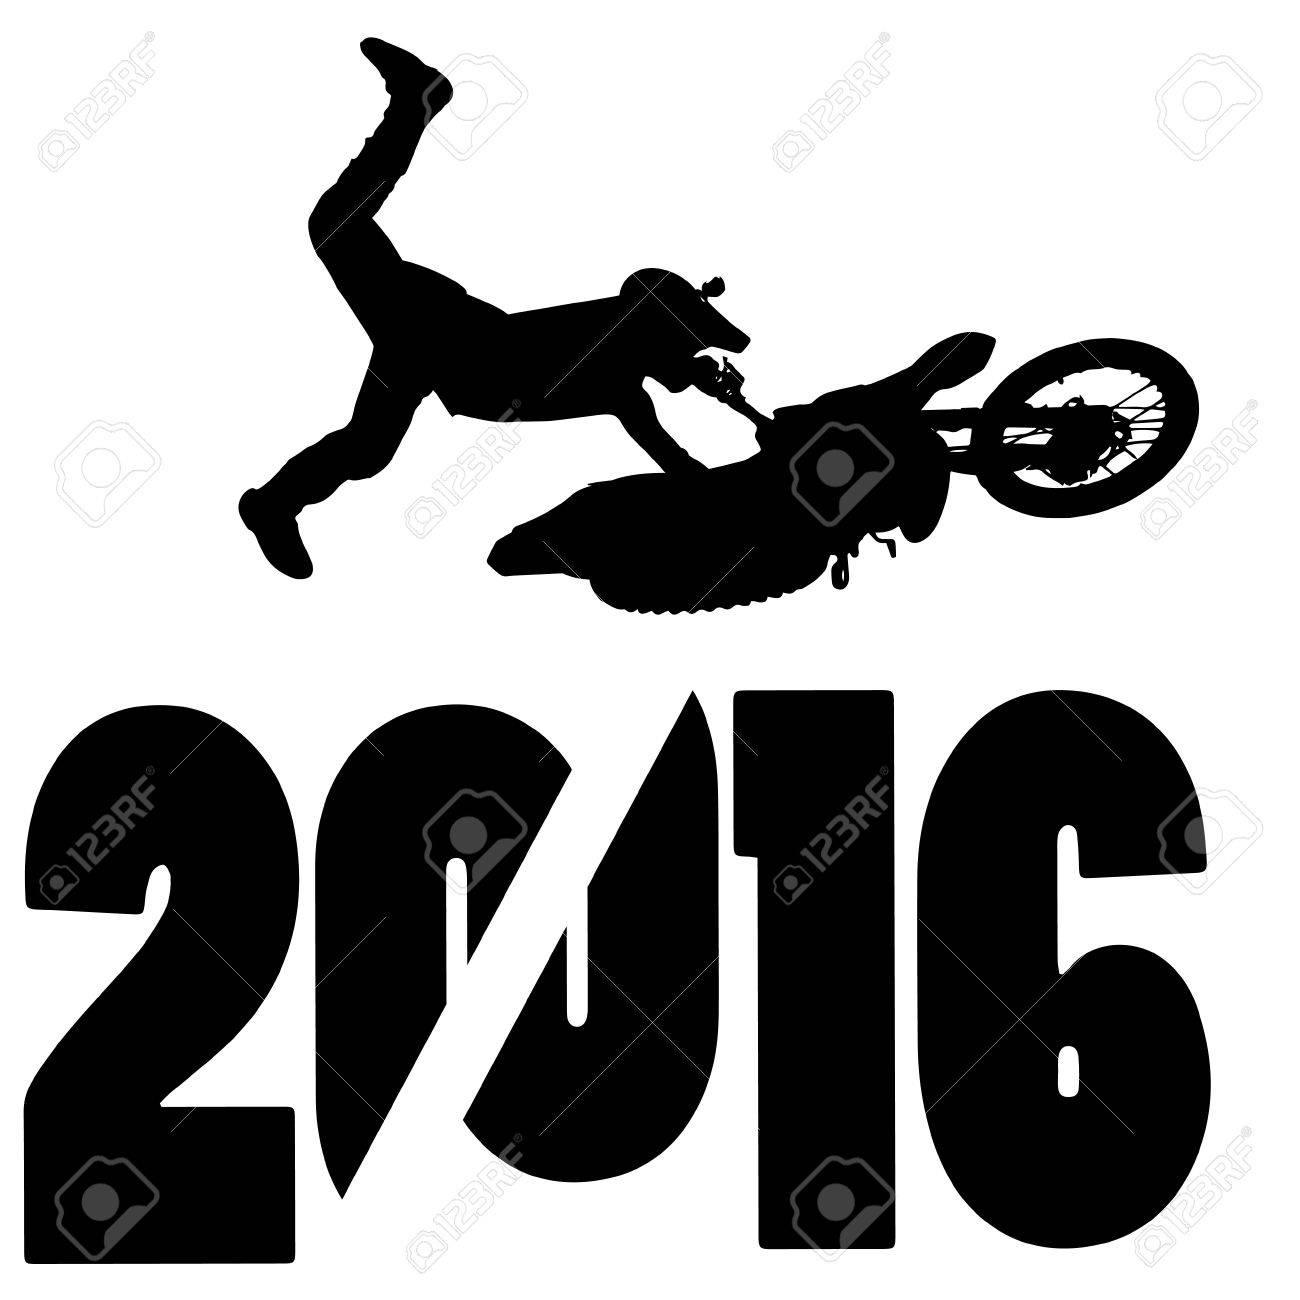 black silhouette vector illustration 2016 New Year - 46204143